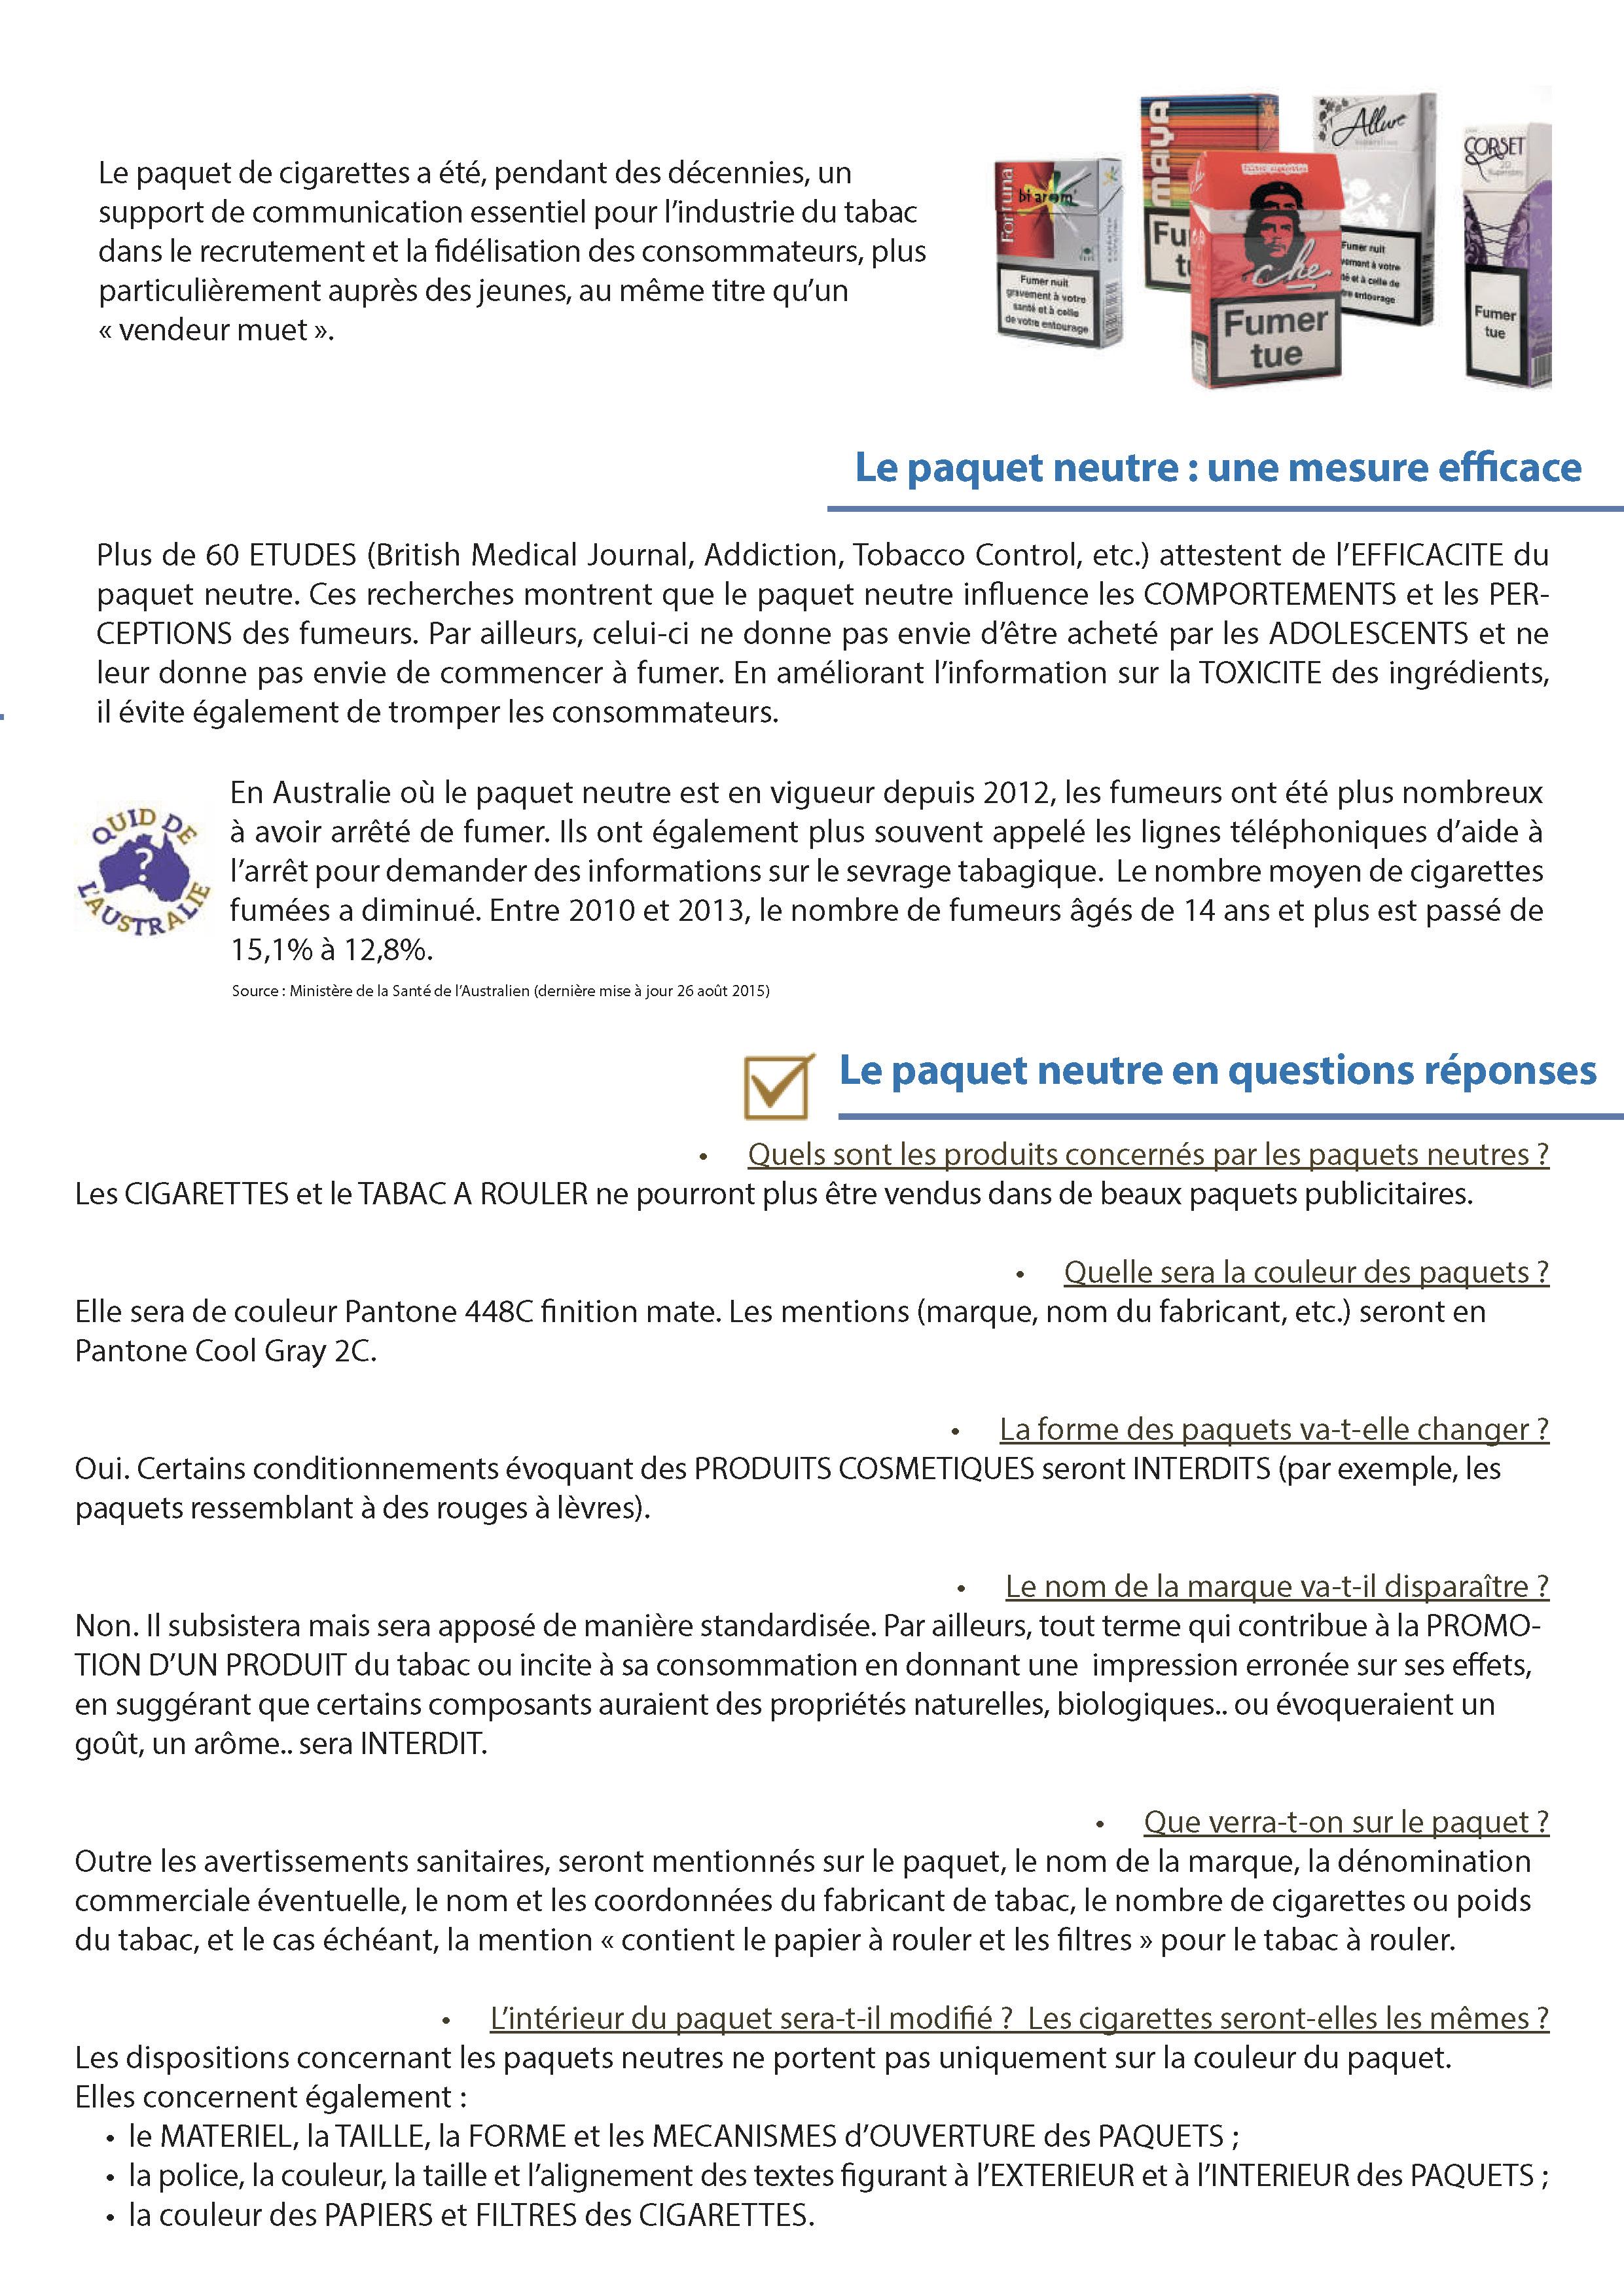 Alliance-DP_journee-mondiale-sans-tabac-avec-annexes-vf-30mai2016_Page_14.jpg